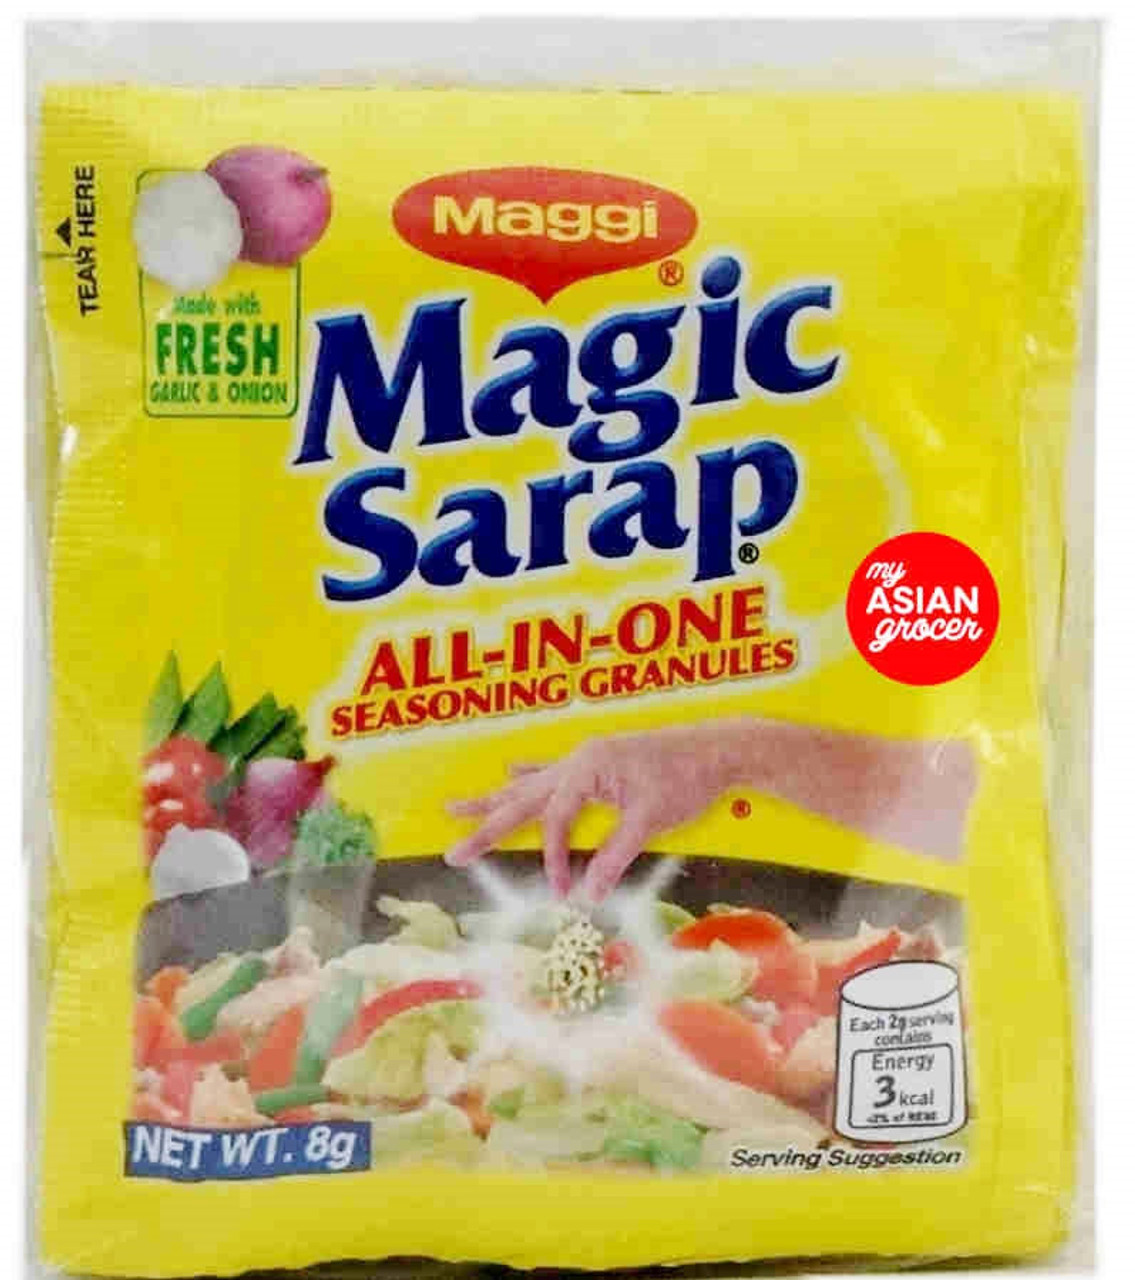 Maggi Magic Sarap All-in-one Seasoning Granules 8g x 12